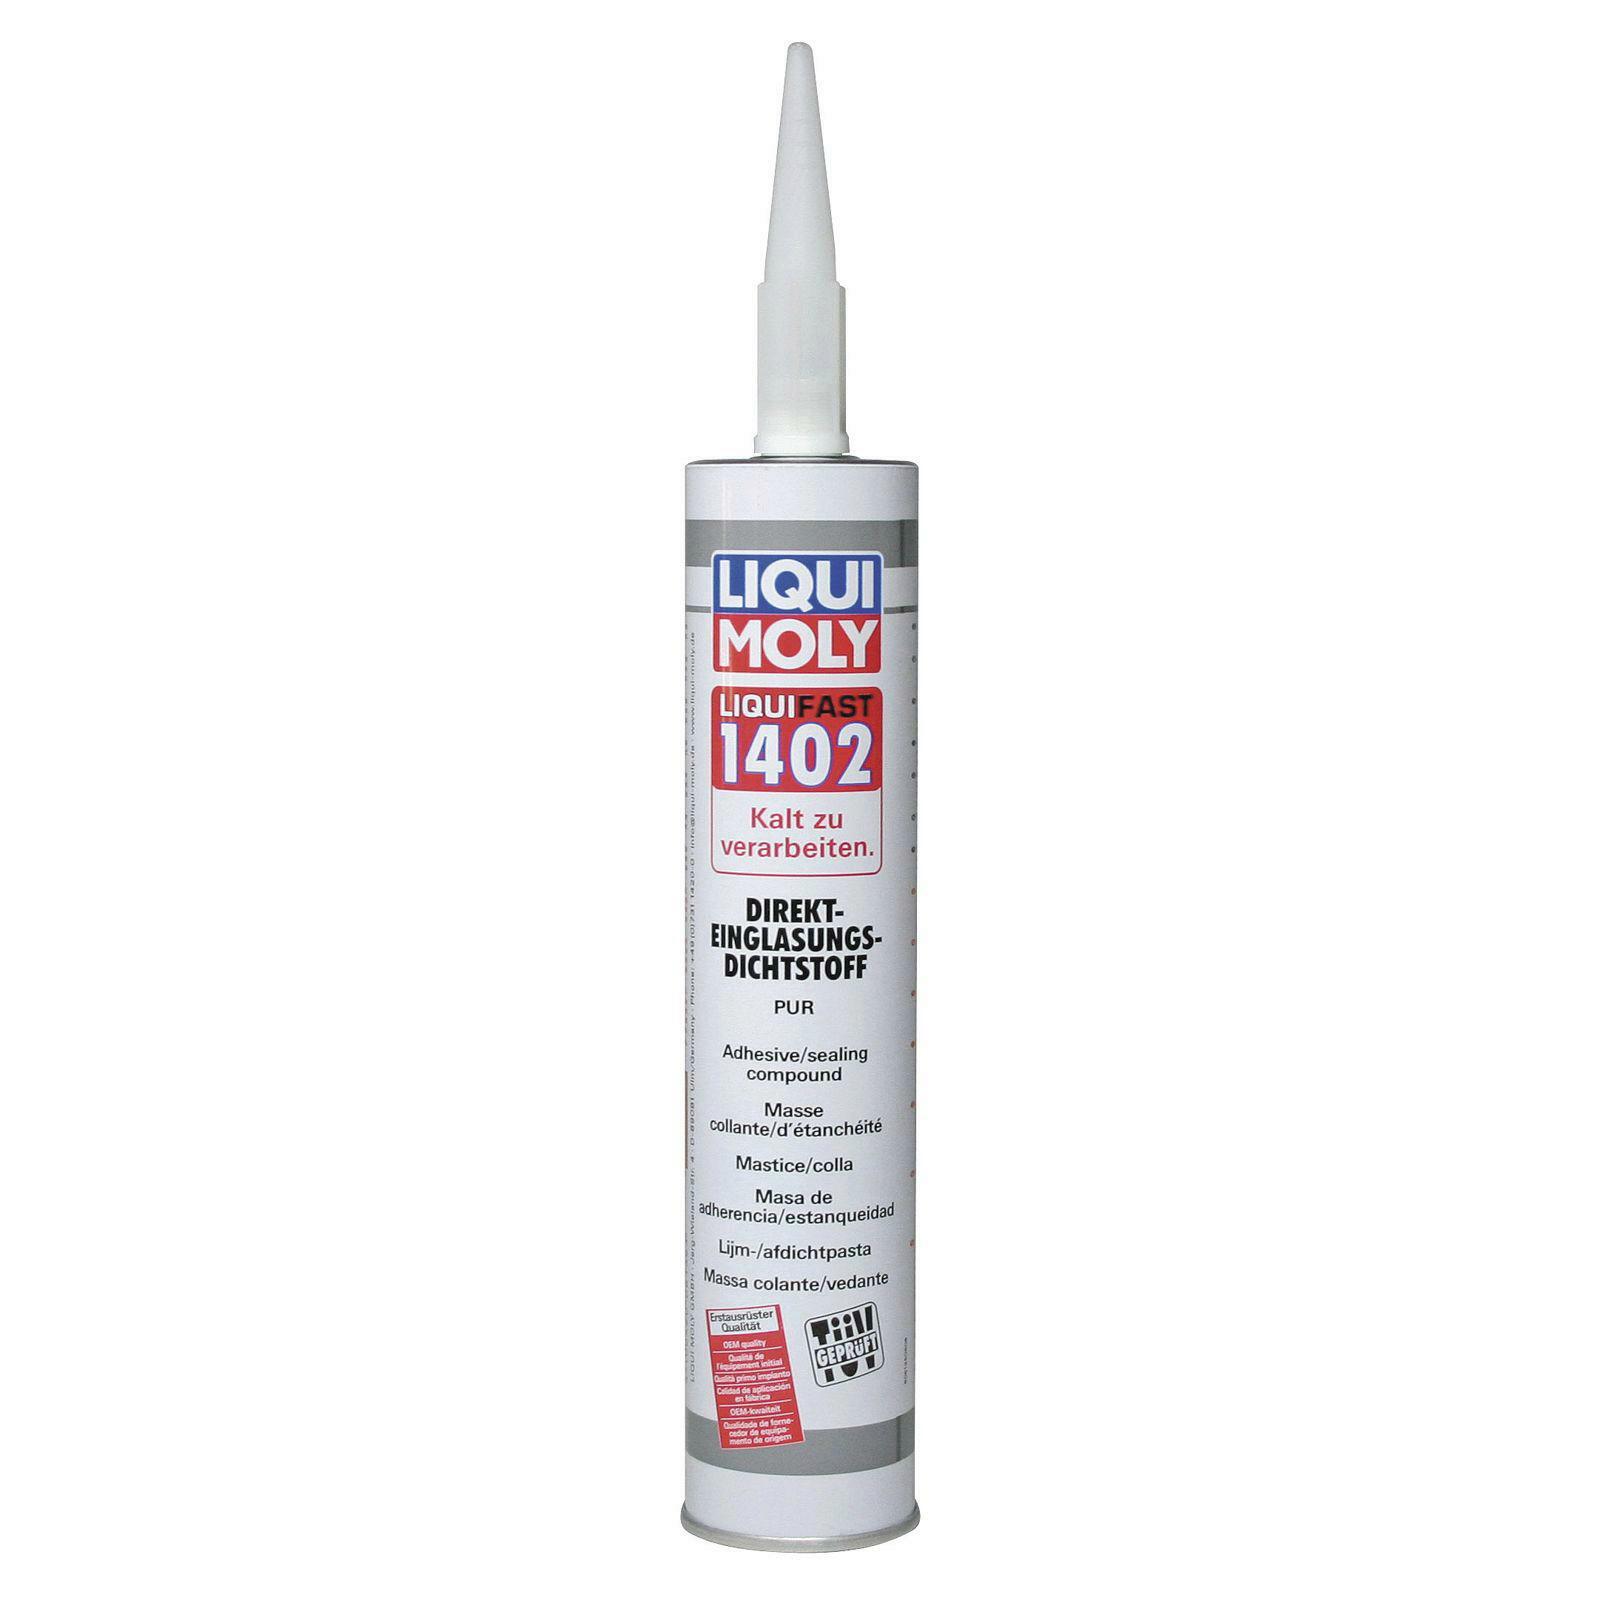 Liqui Moly Liquifast 1402 310ml